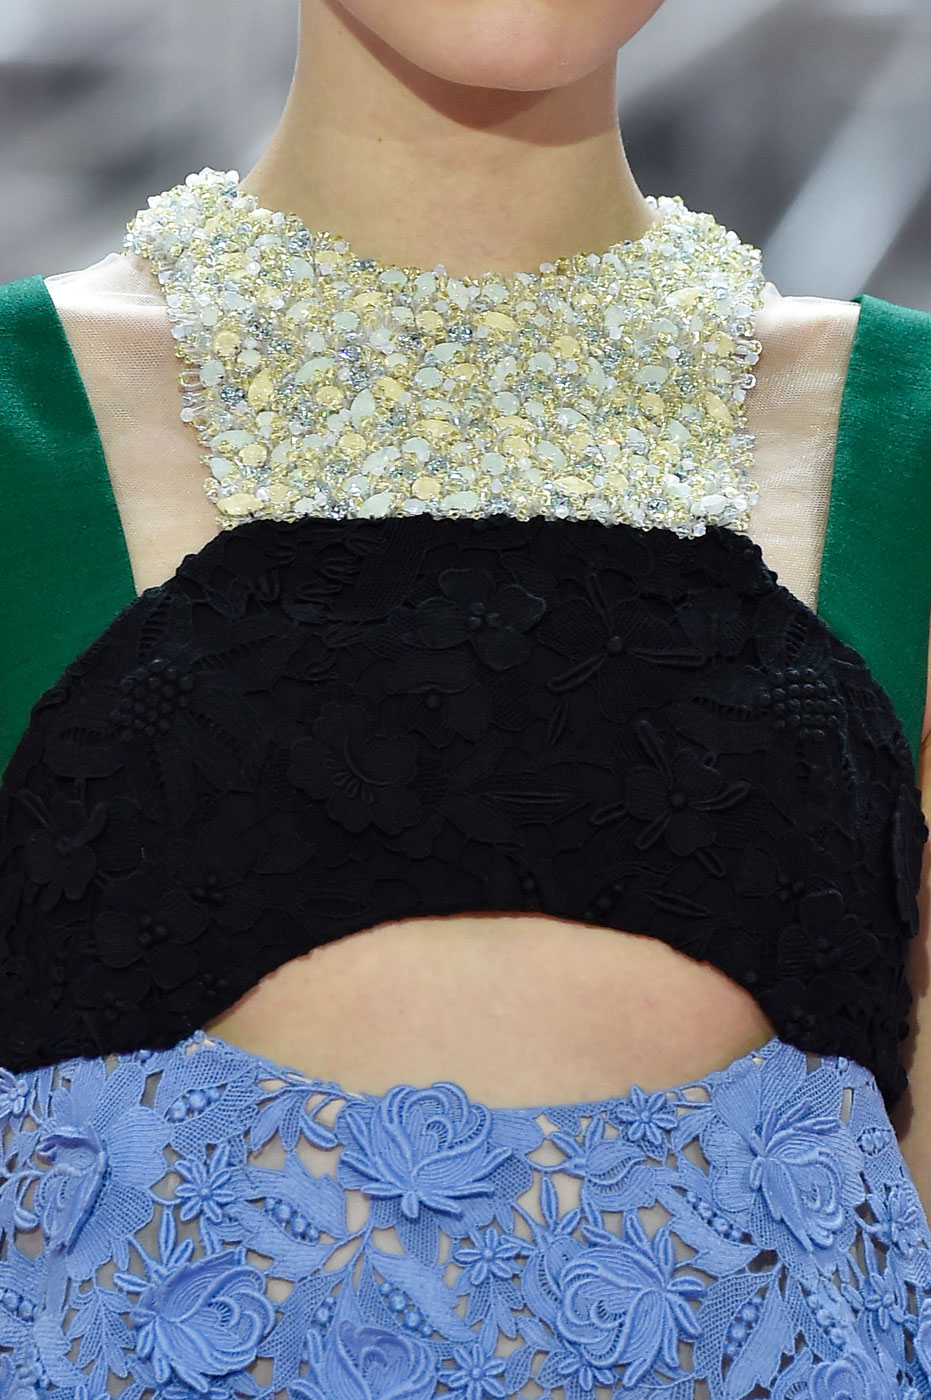 Christian-Dior-fashion-runway-show-close-ups-haute-couture-paris-spring-summer-2015-the-impression-071